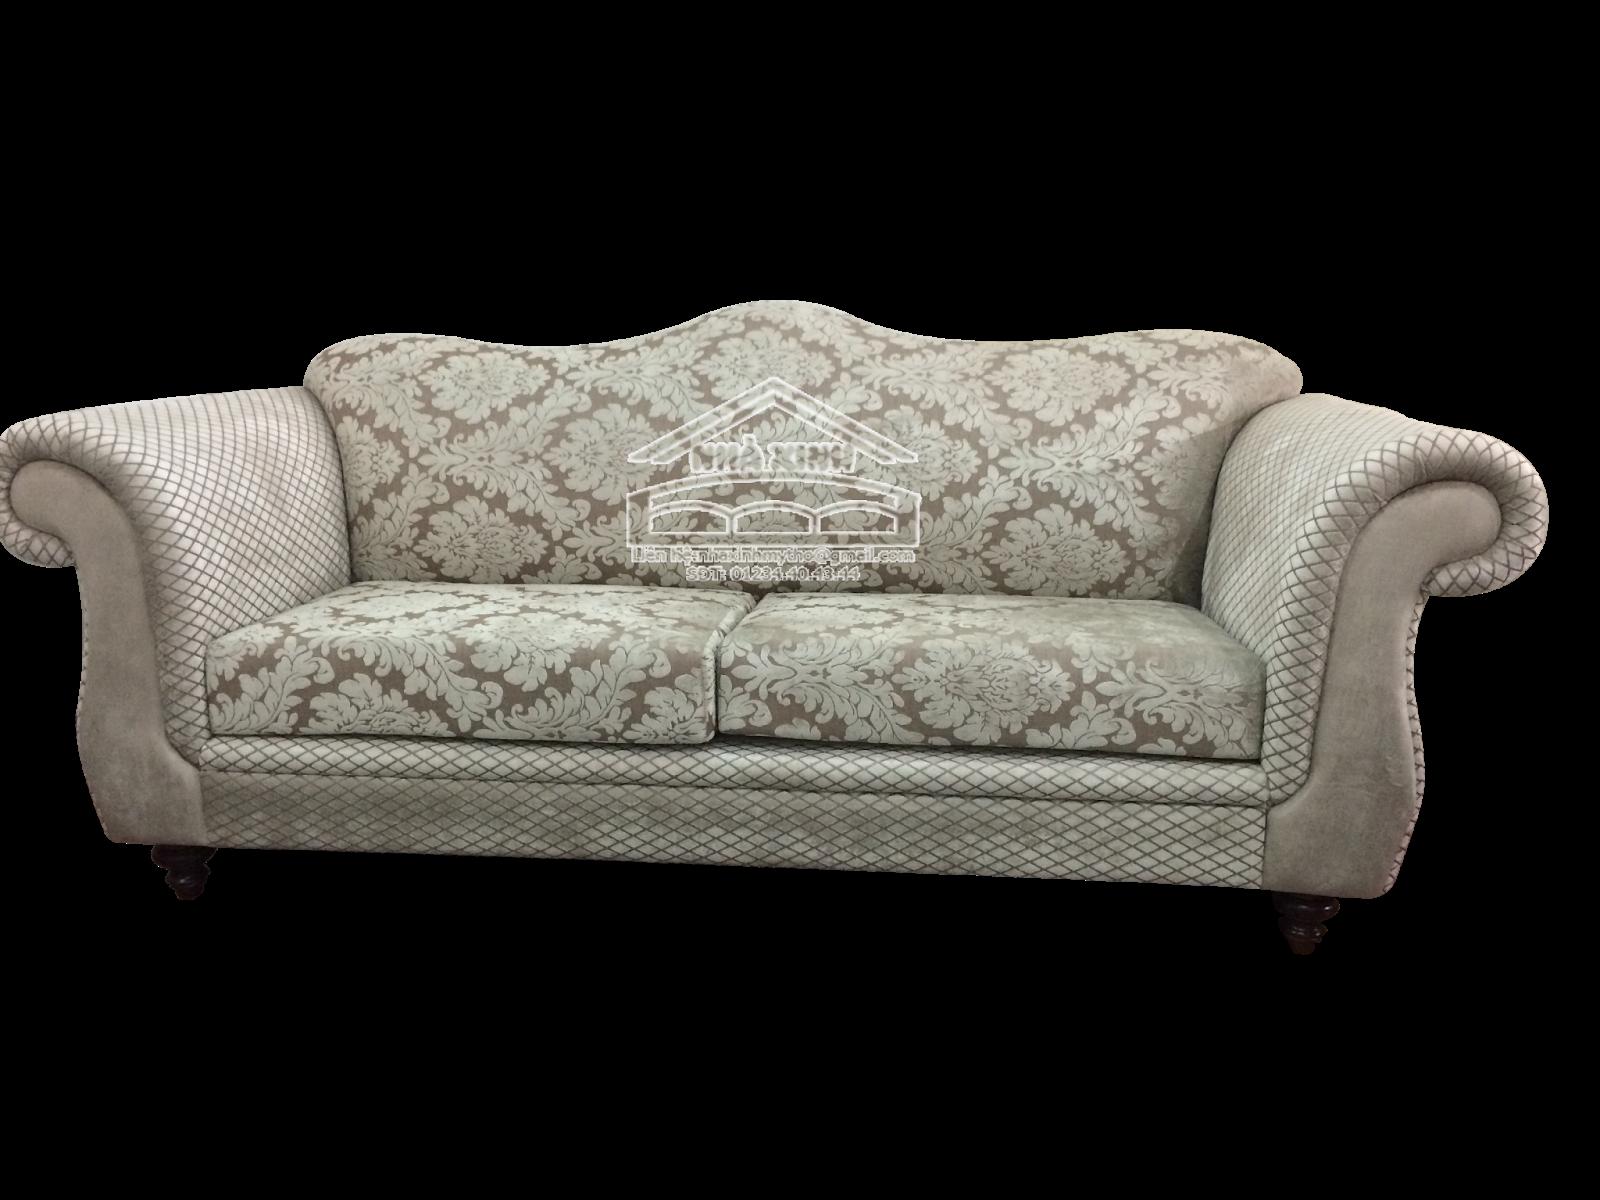 Sofa i di n nh xinh m tho sfnx 033 for Sofa bed nha xinh